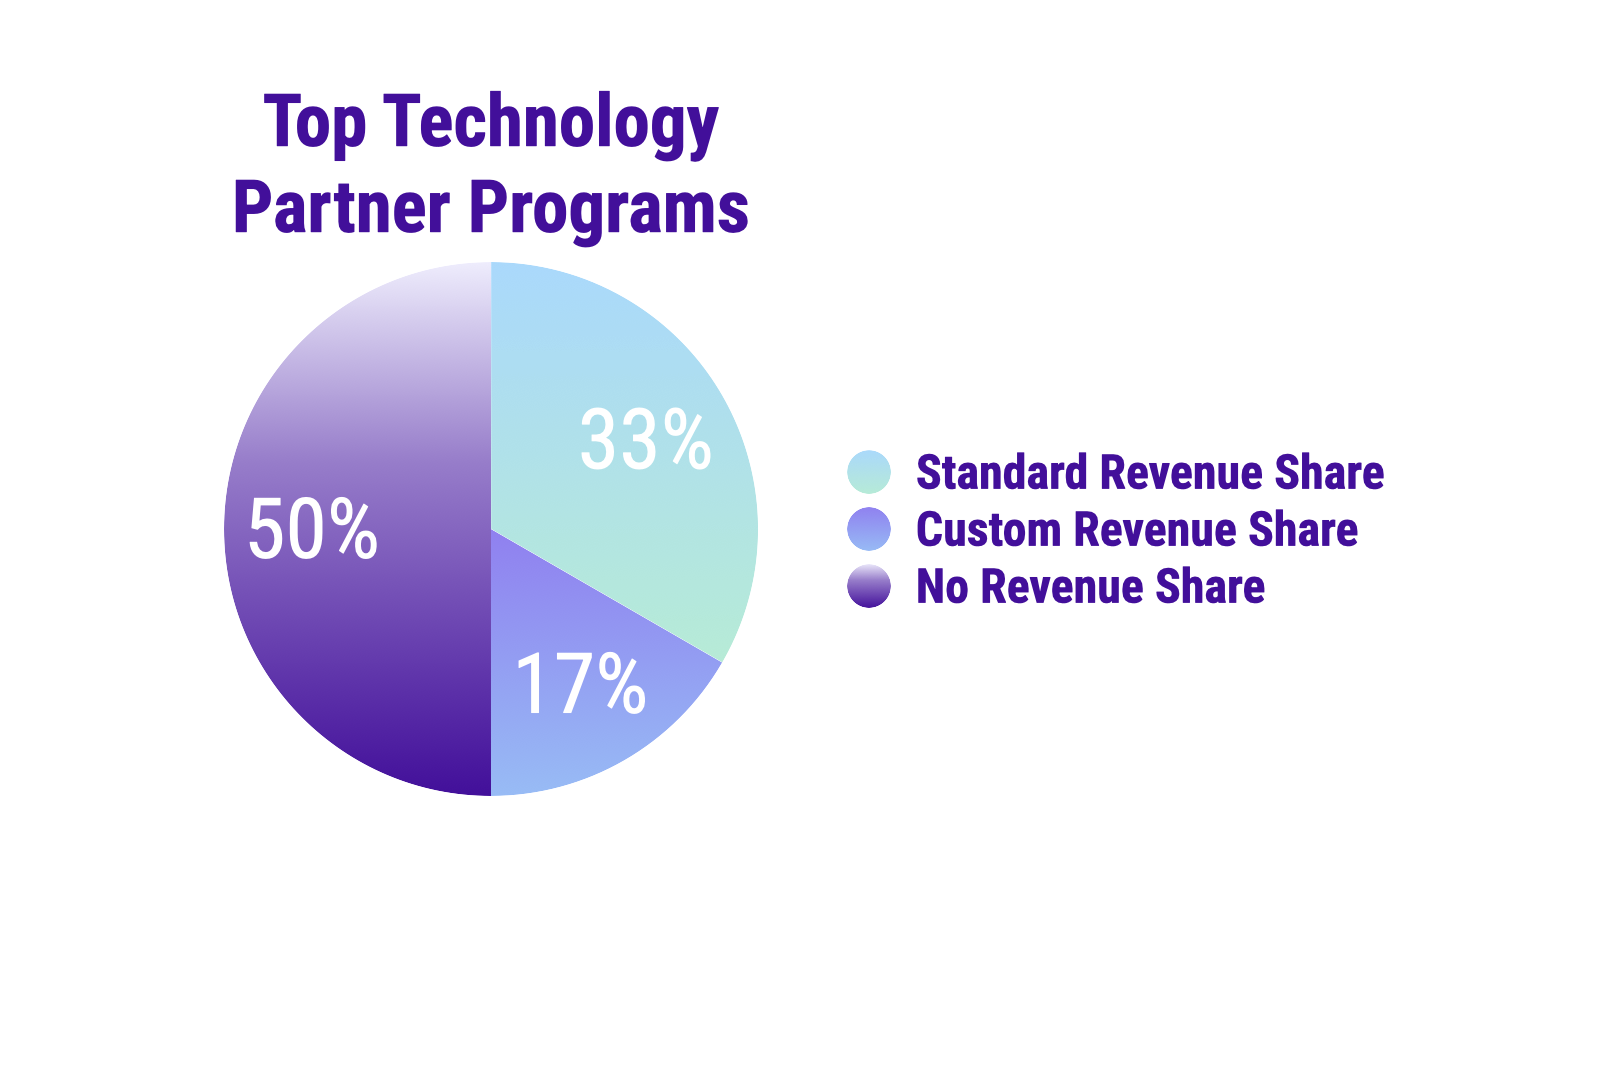 Top Technology Partner Programs Revenue Share